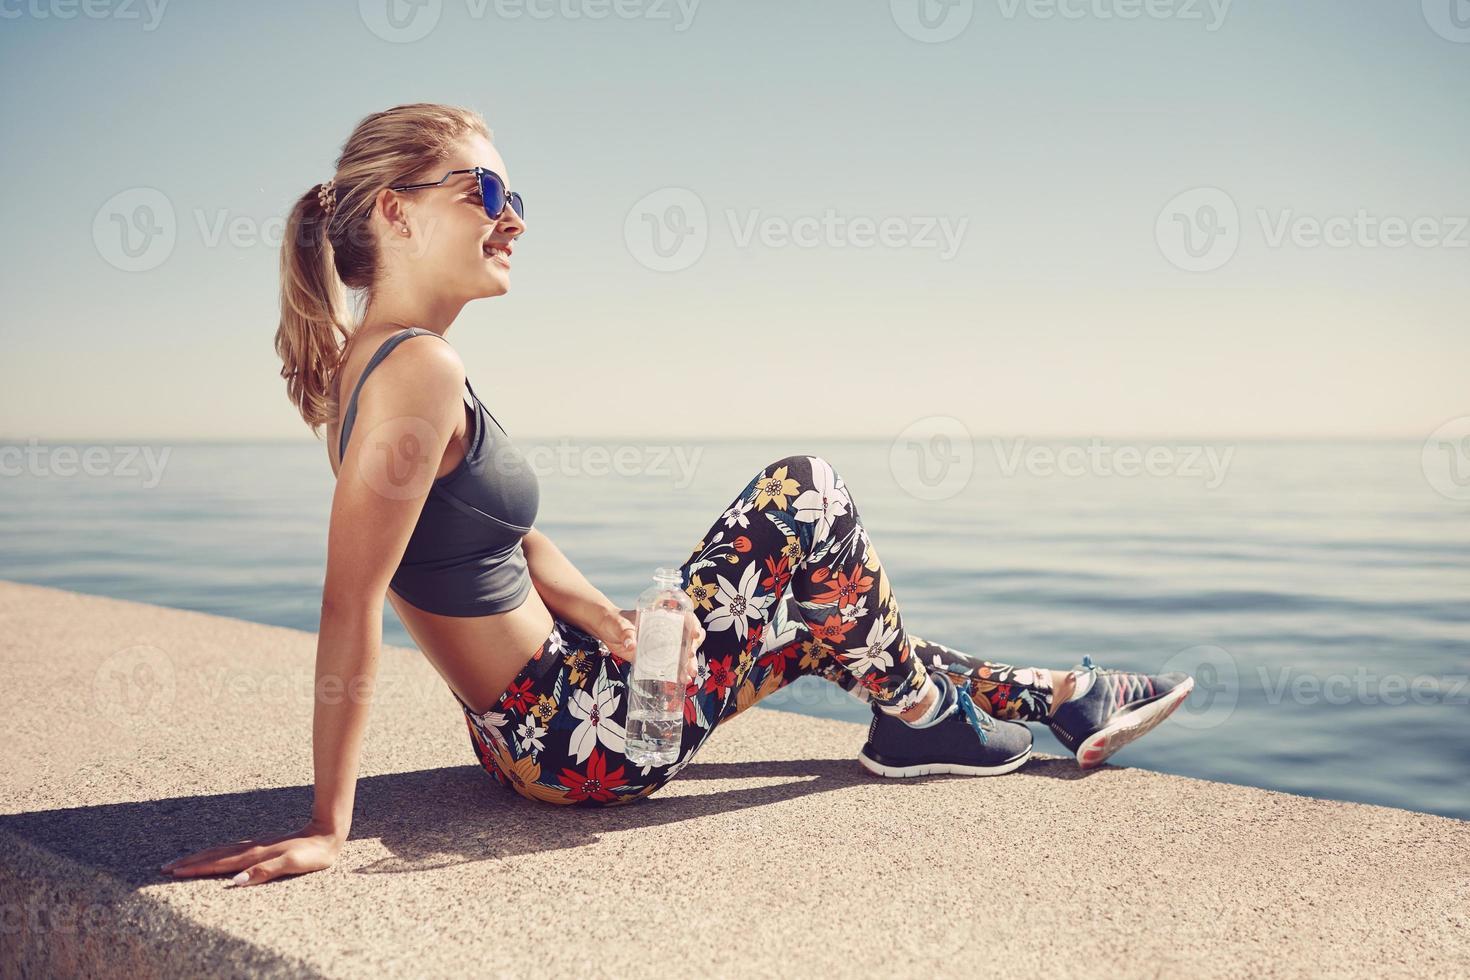 joven fitness mujer rubia sostenga la botella después del ajuste en la playa foto